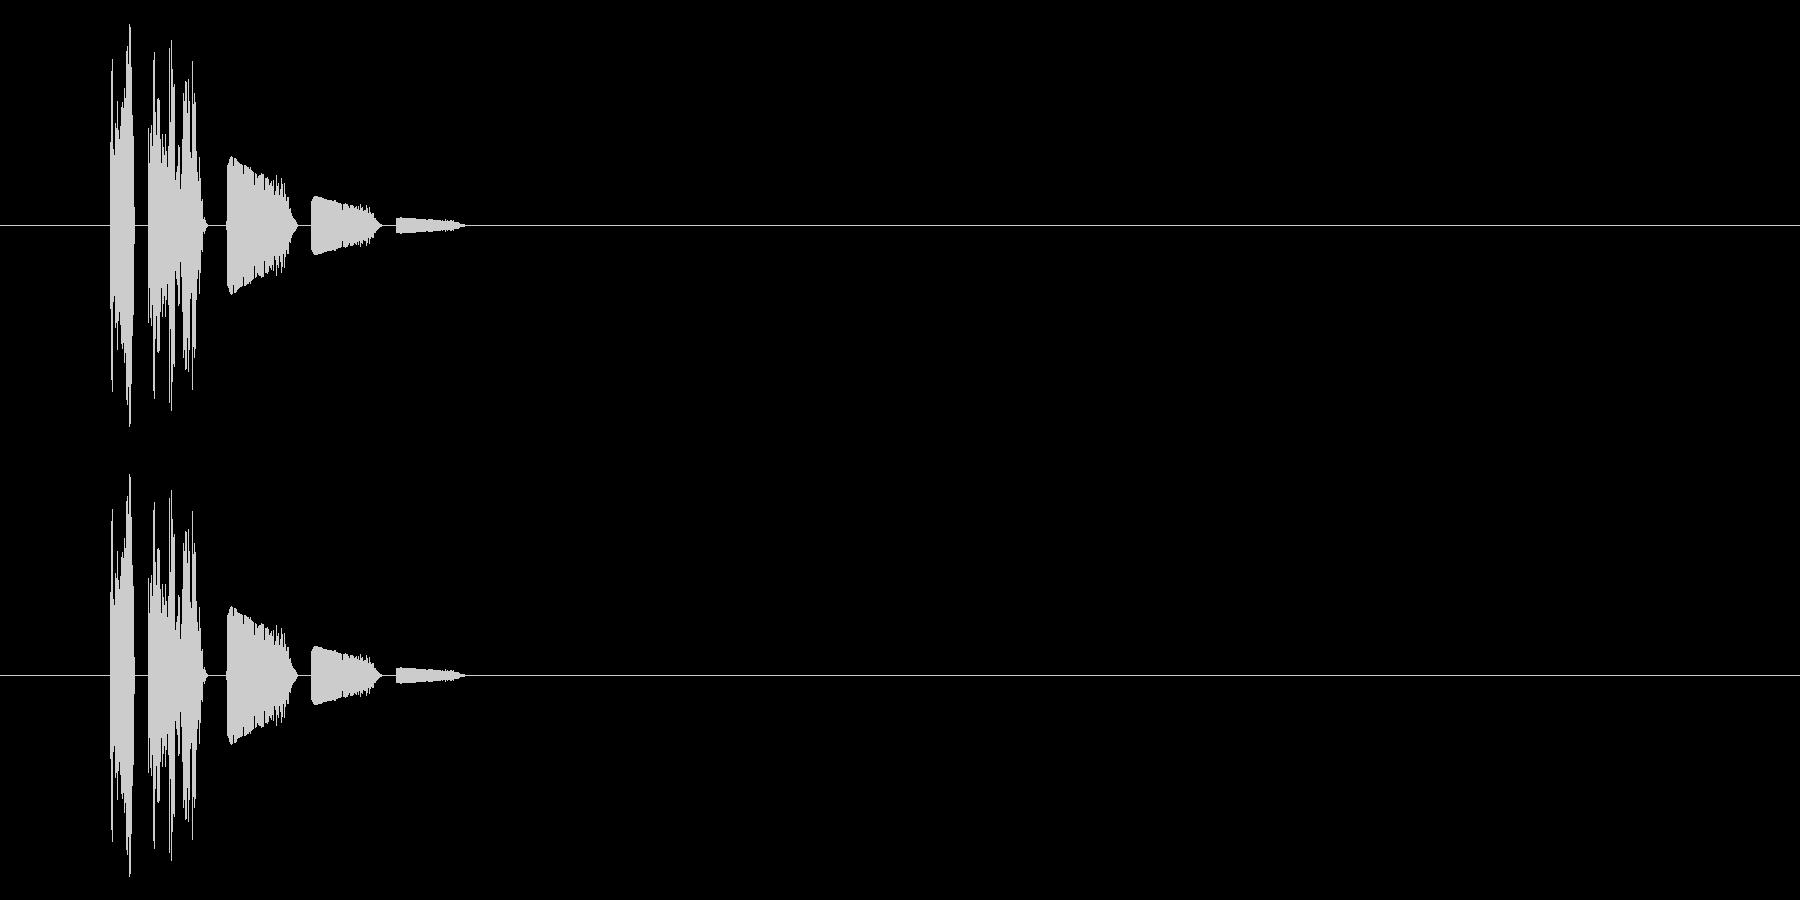 SNES-アクション01-11(ダメージの未再生の波形